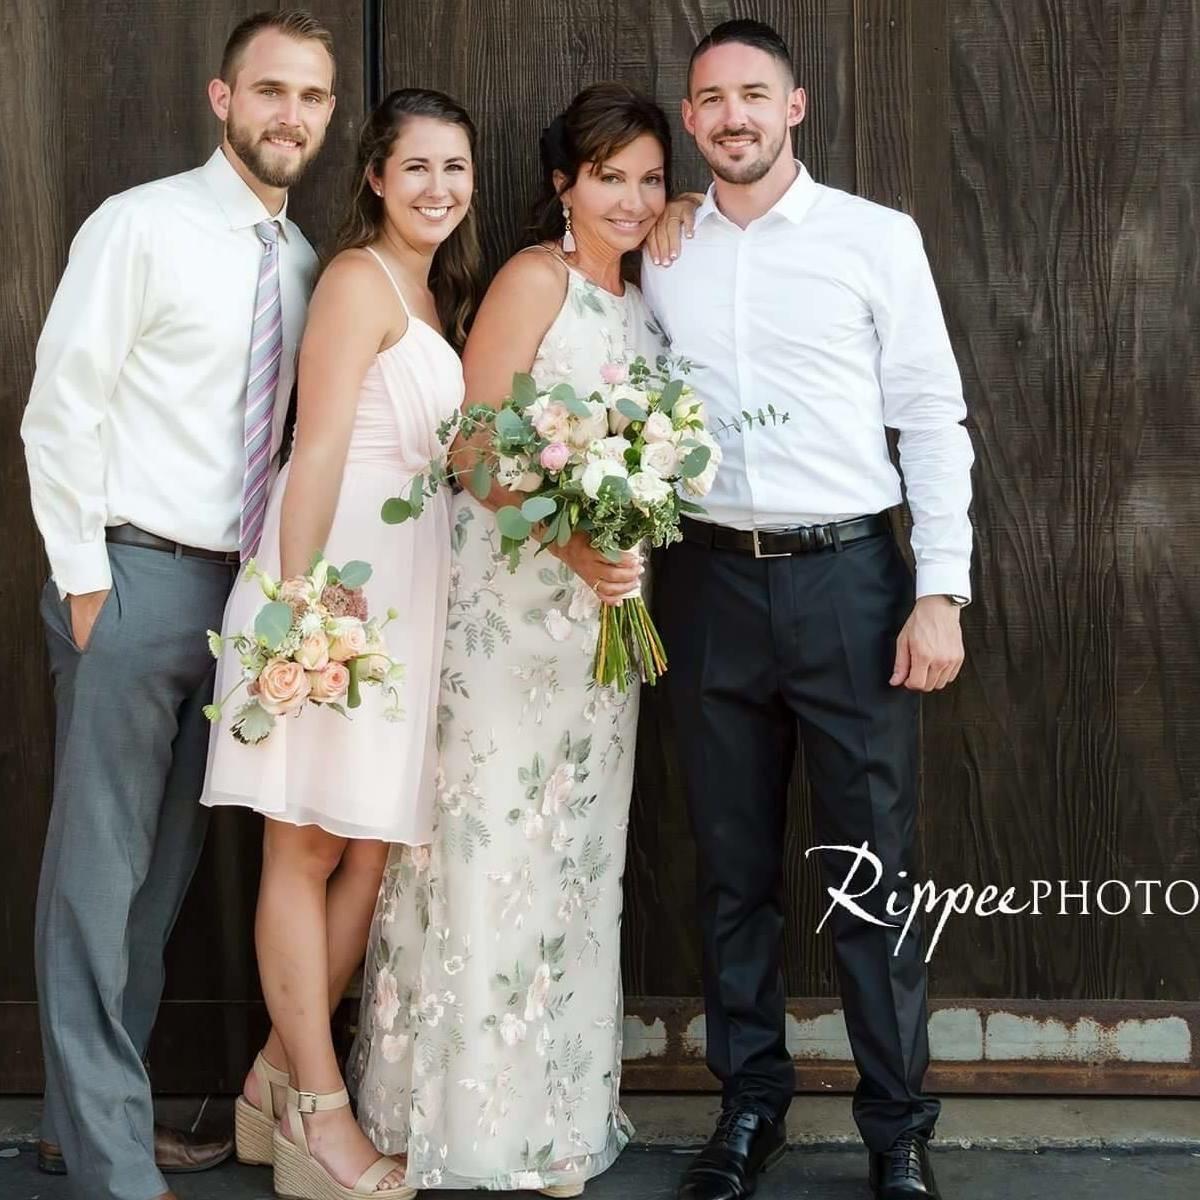 Shari French Wedding2 copy.JPG